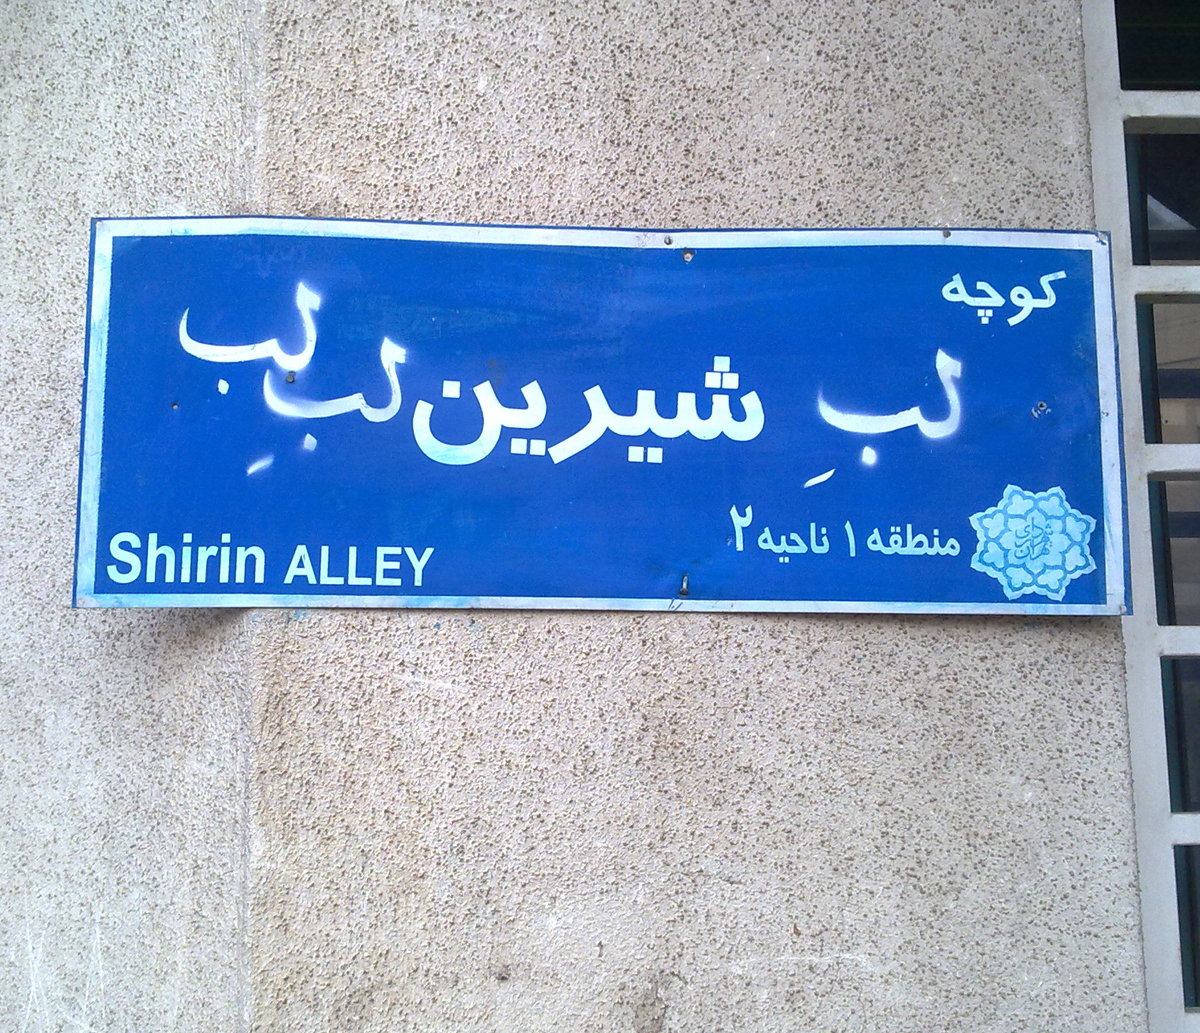 لب شیرین لب لب - تابلو - کوچه - گرافیتی - graffiti- tehran - تهران - خیالباف - daydreamer